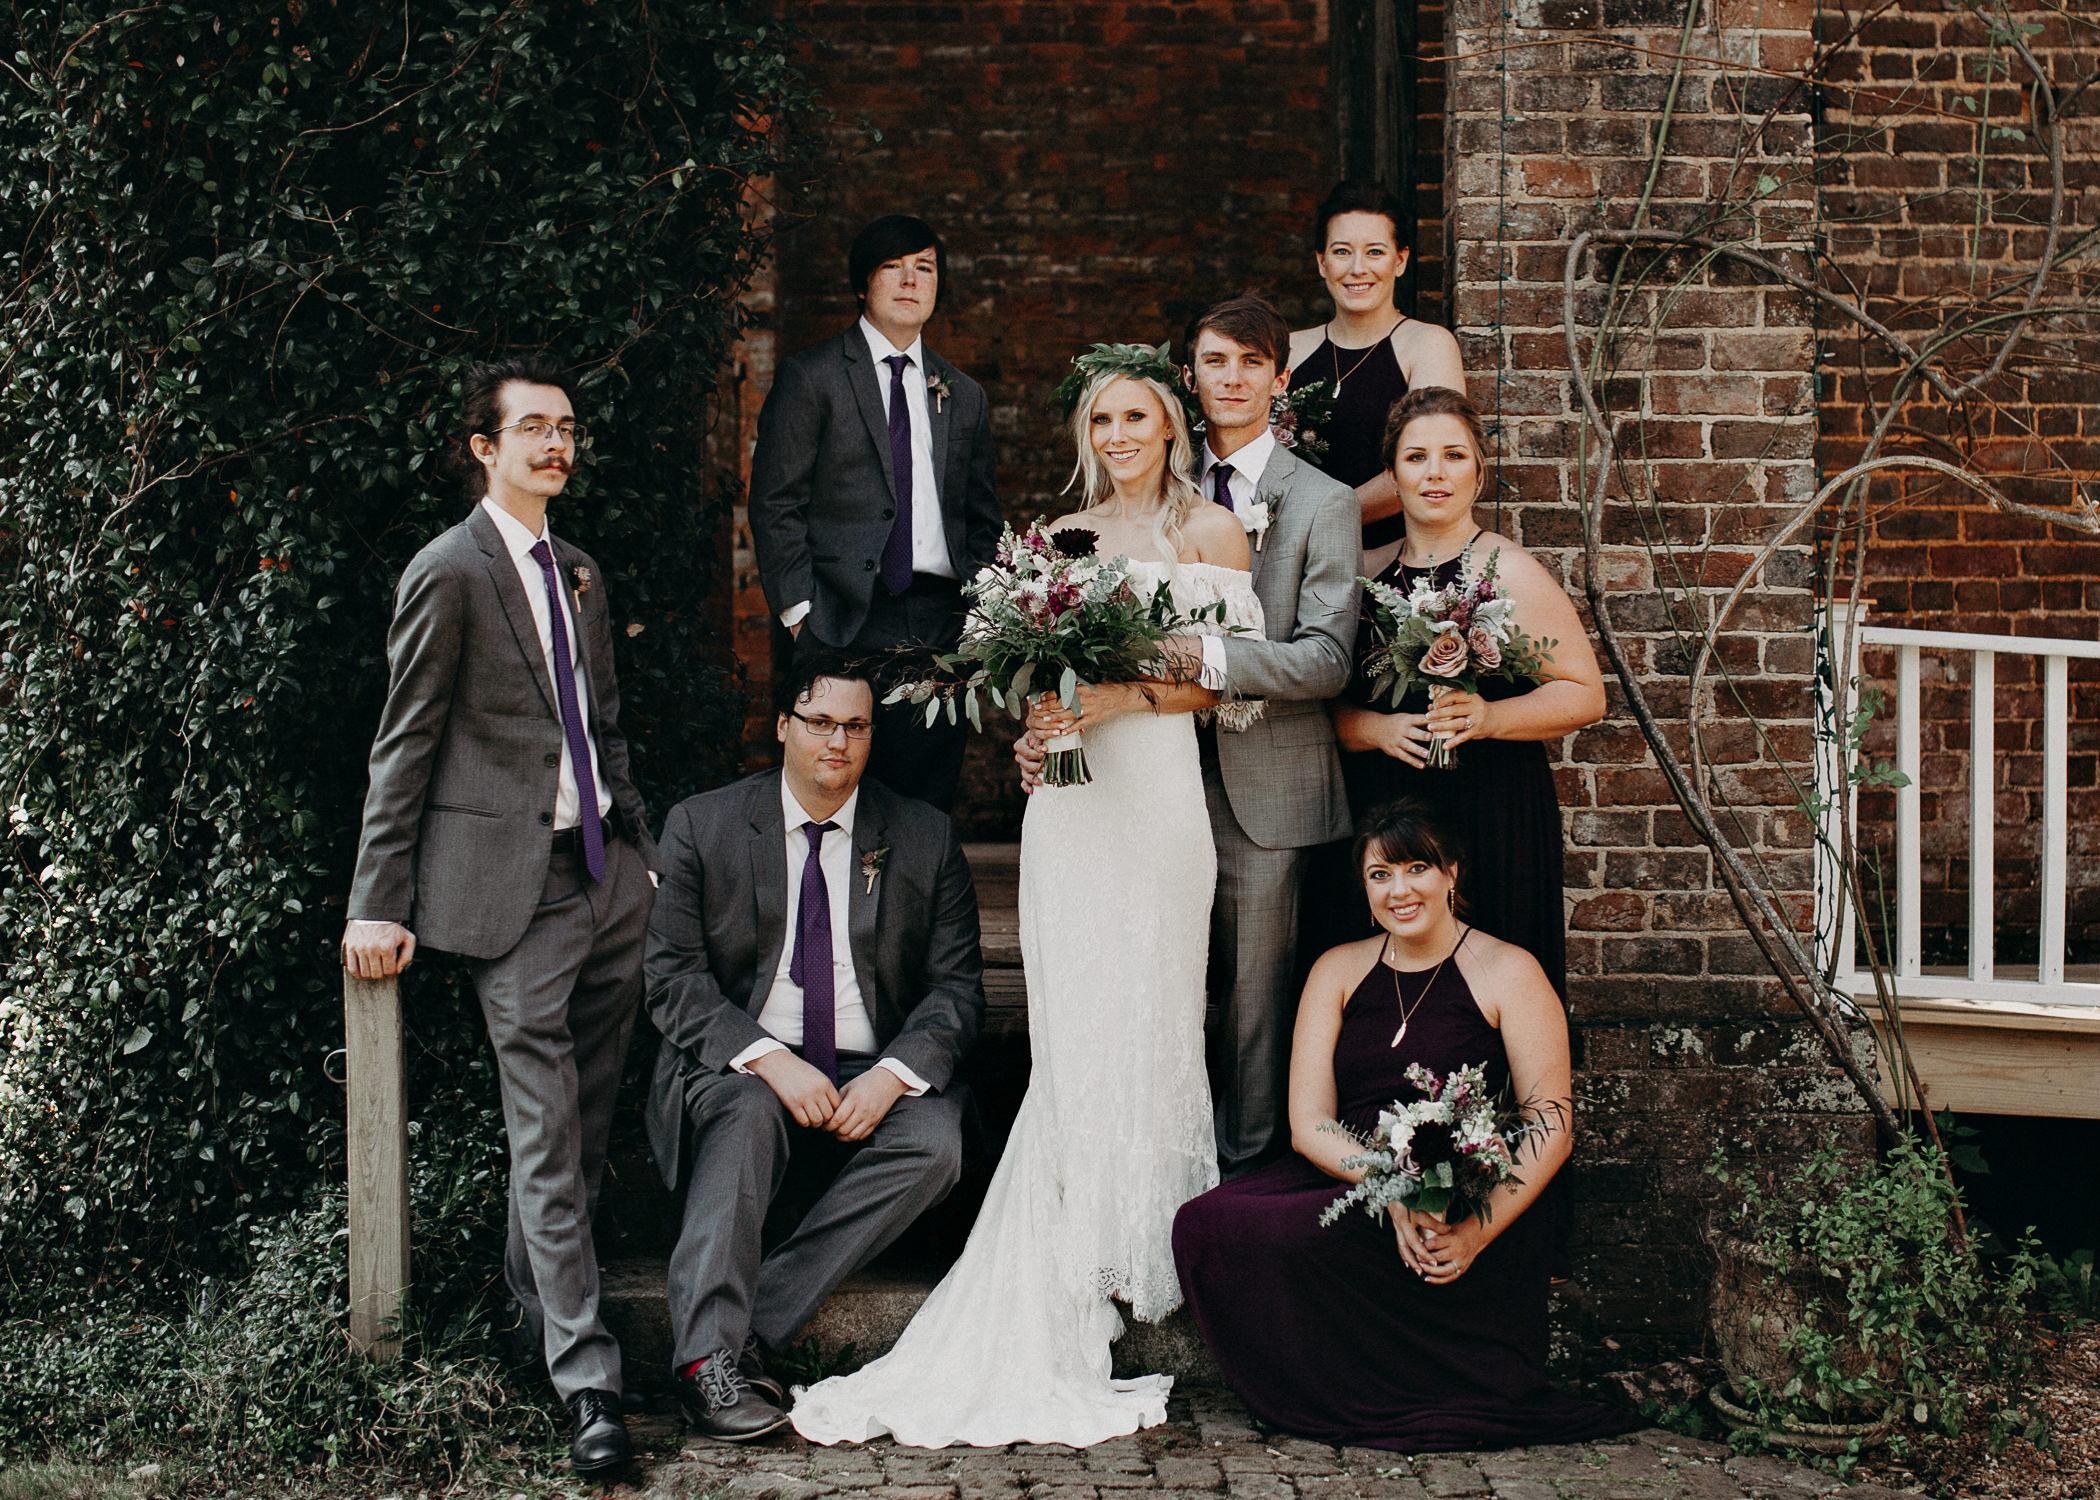 42 - Barnsley Gardens Wedding - Wedding Party portraits - First Look .jpg